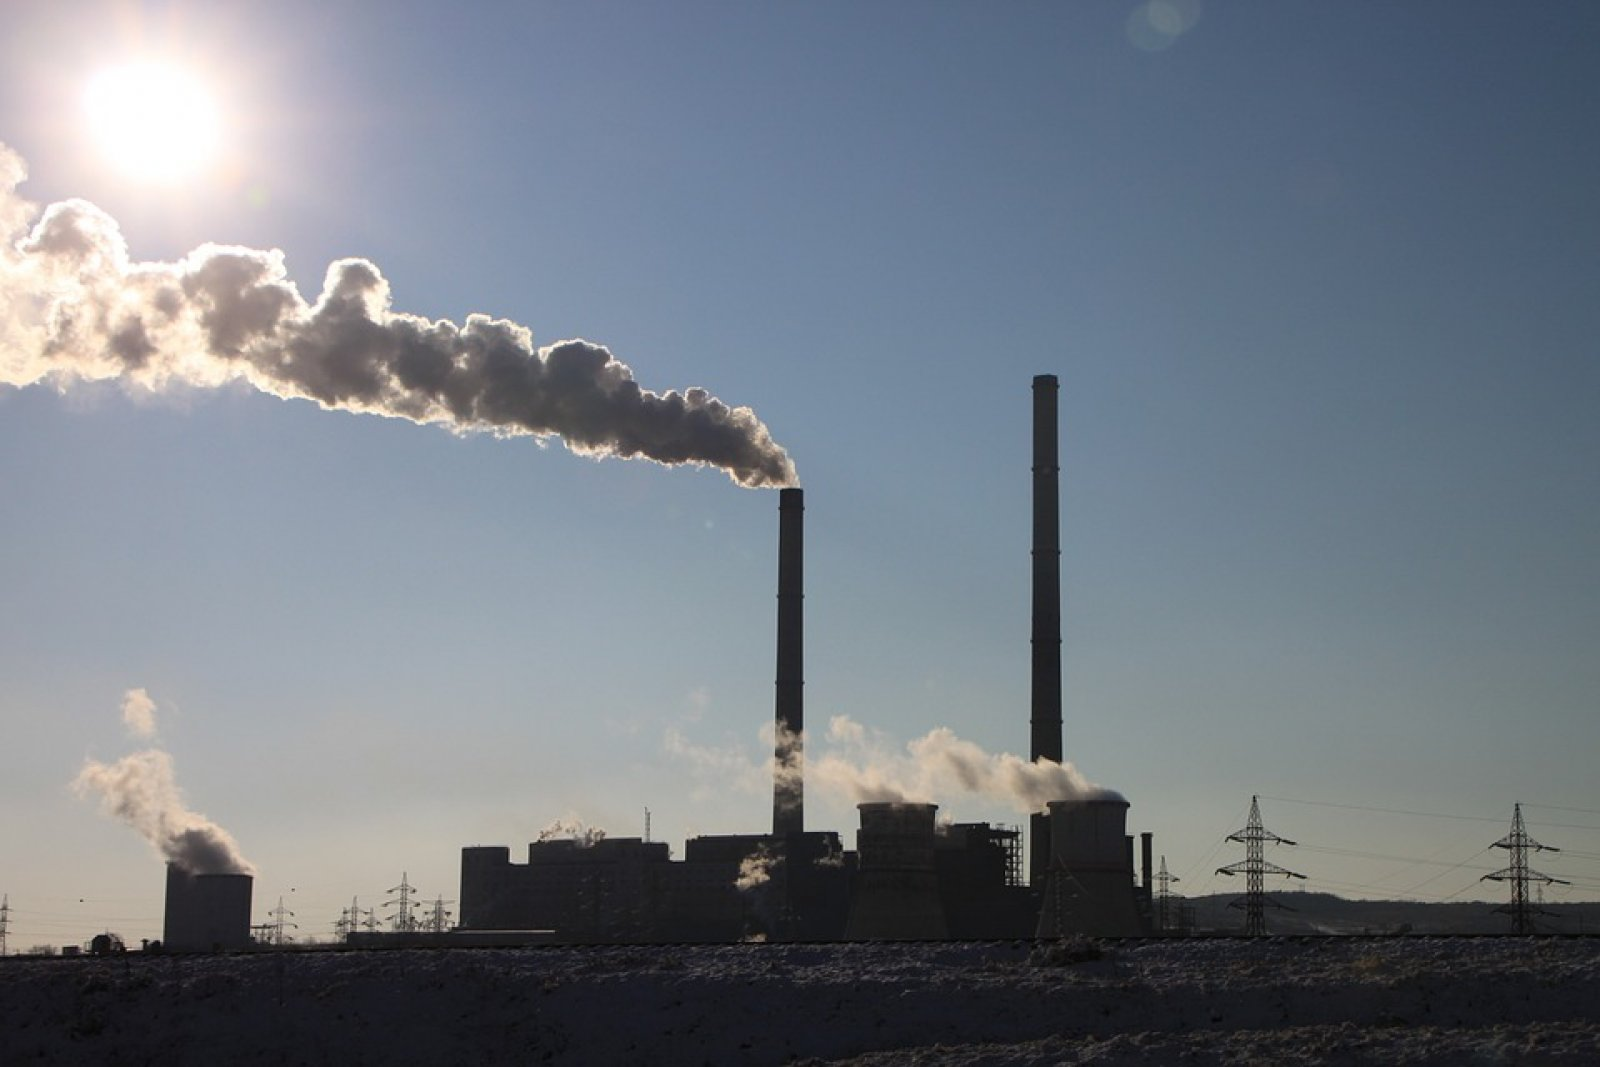 gasos efecte hivernacle